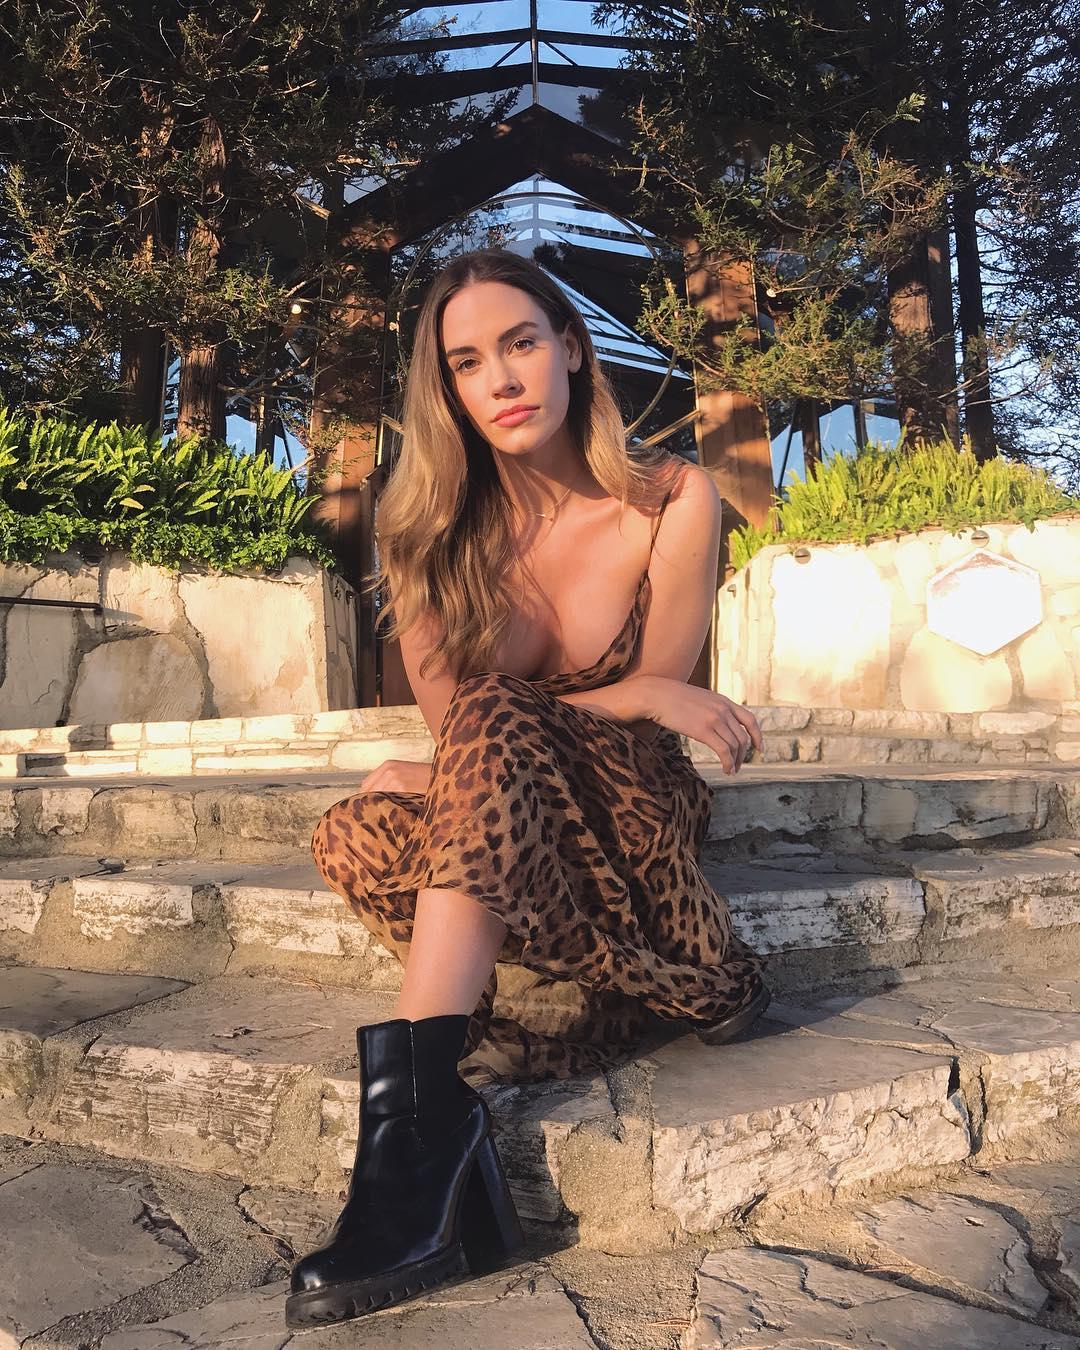 Pussy Marissa Jade nudes (71 photos), Topless, Cleavage, Instagram, swimsuit 2006